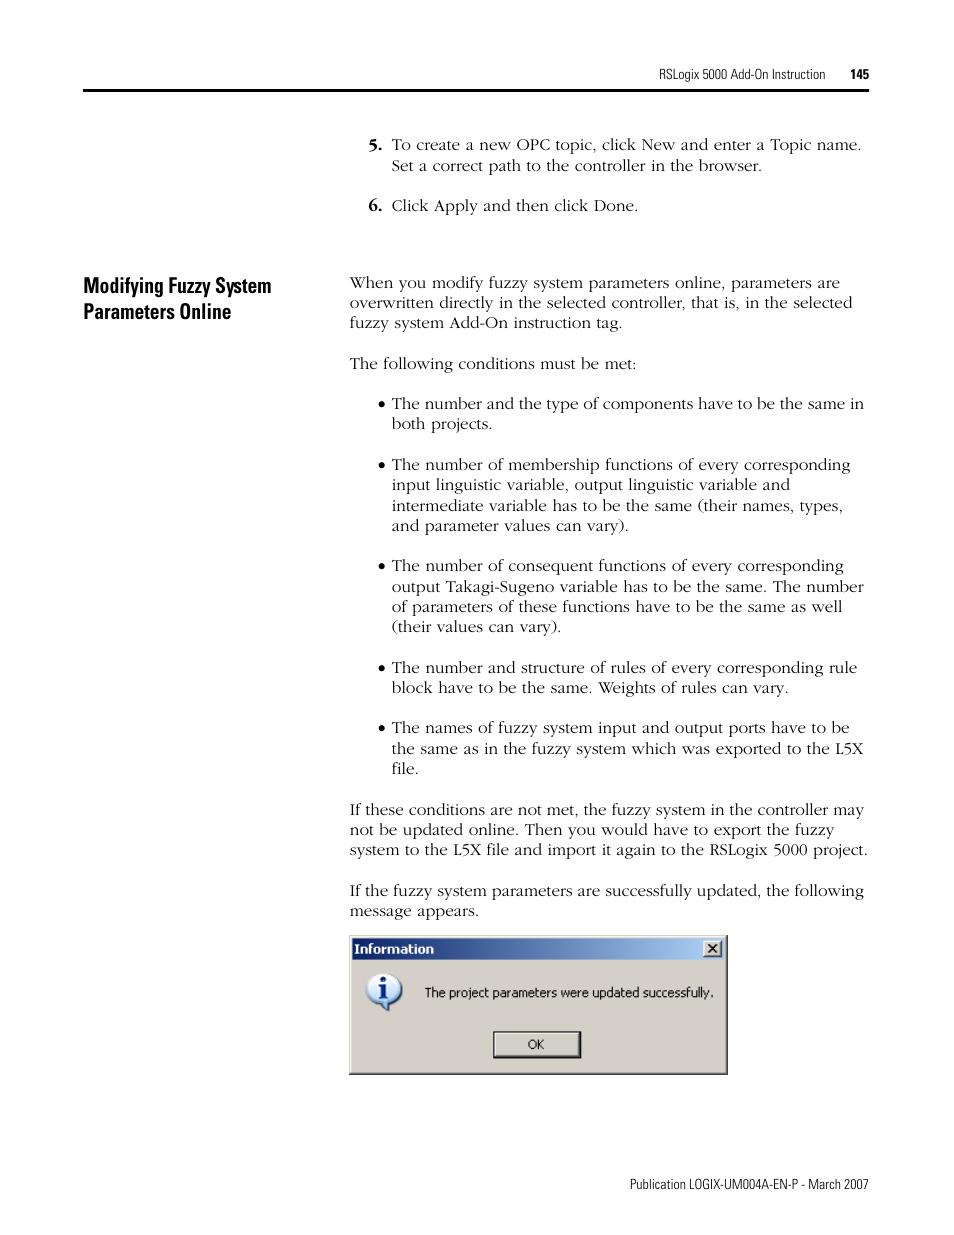 modifying fuzzy system parameters online rockwell automation rh manualsdir com rslogix 5000 manual portugues manuales rslogix 5000 español